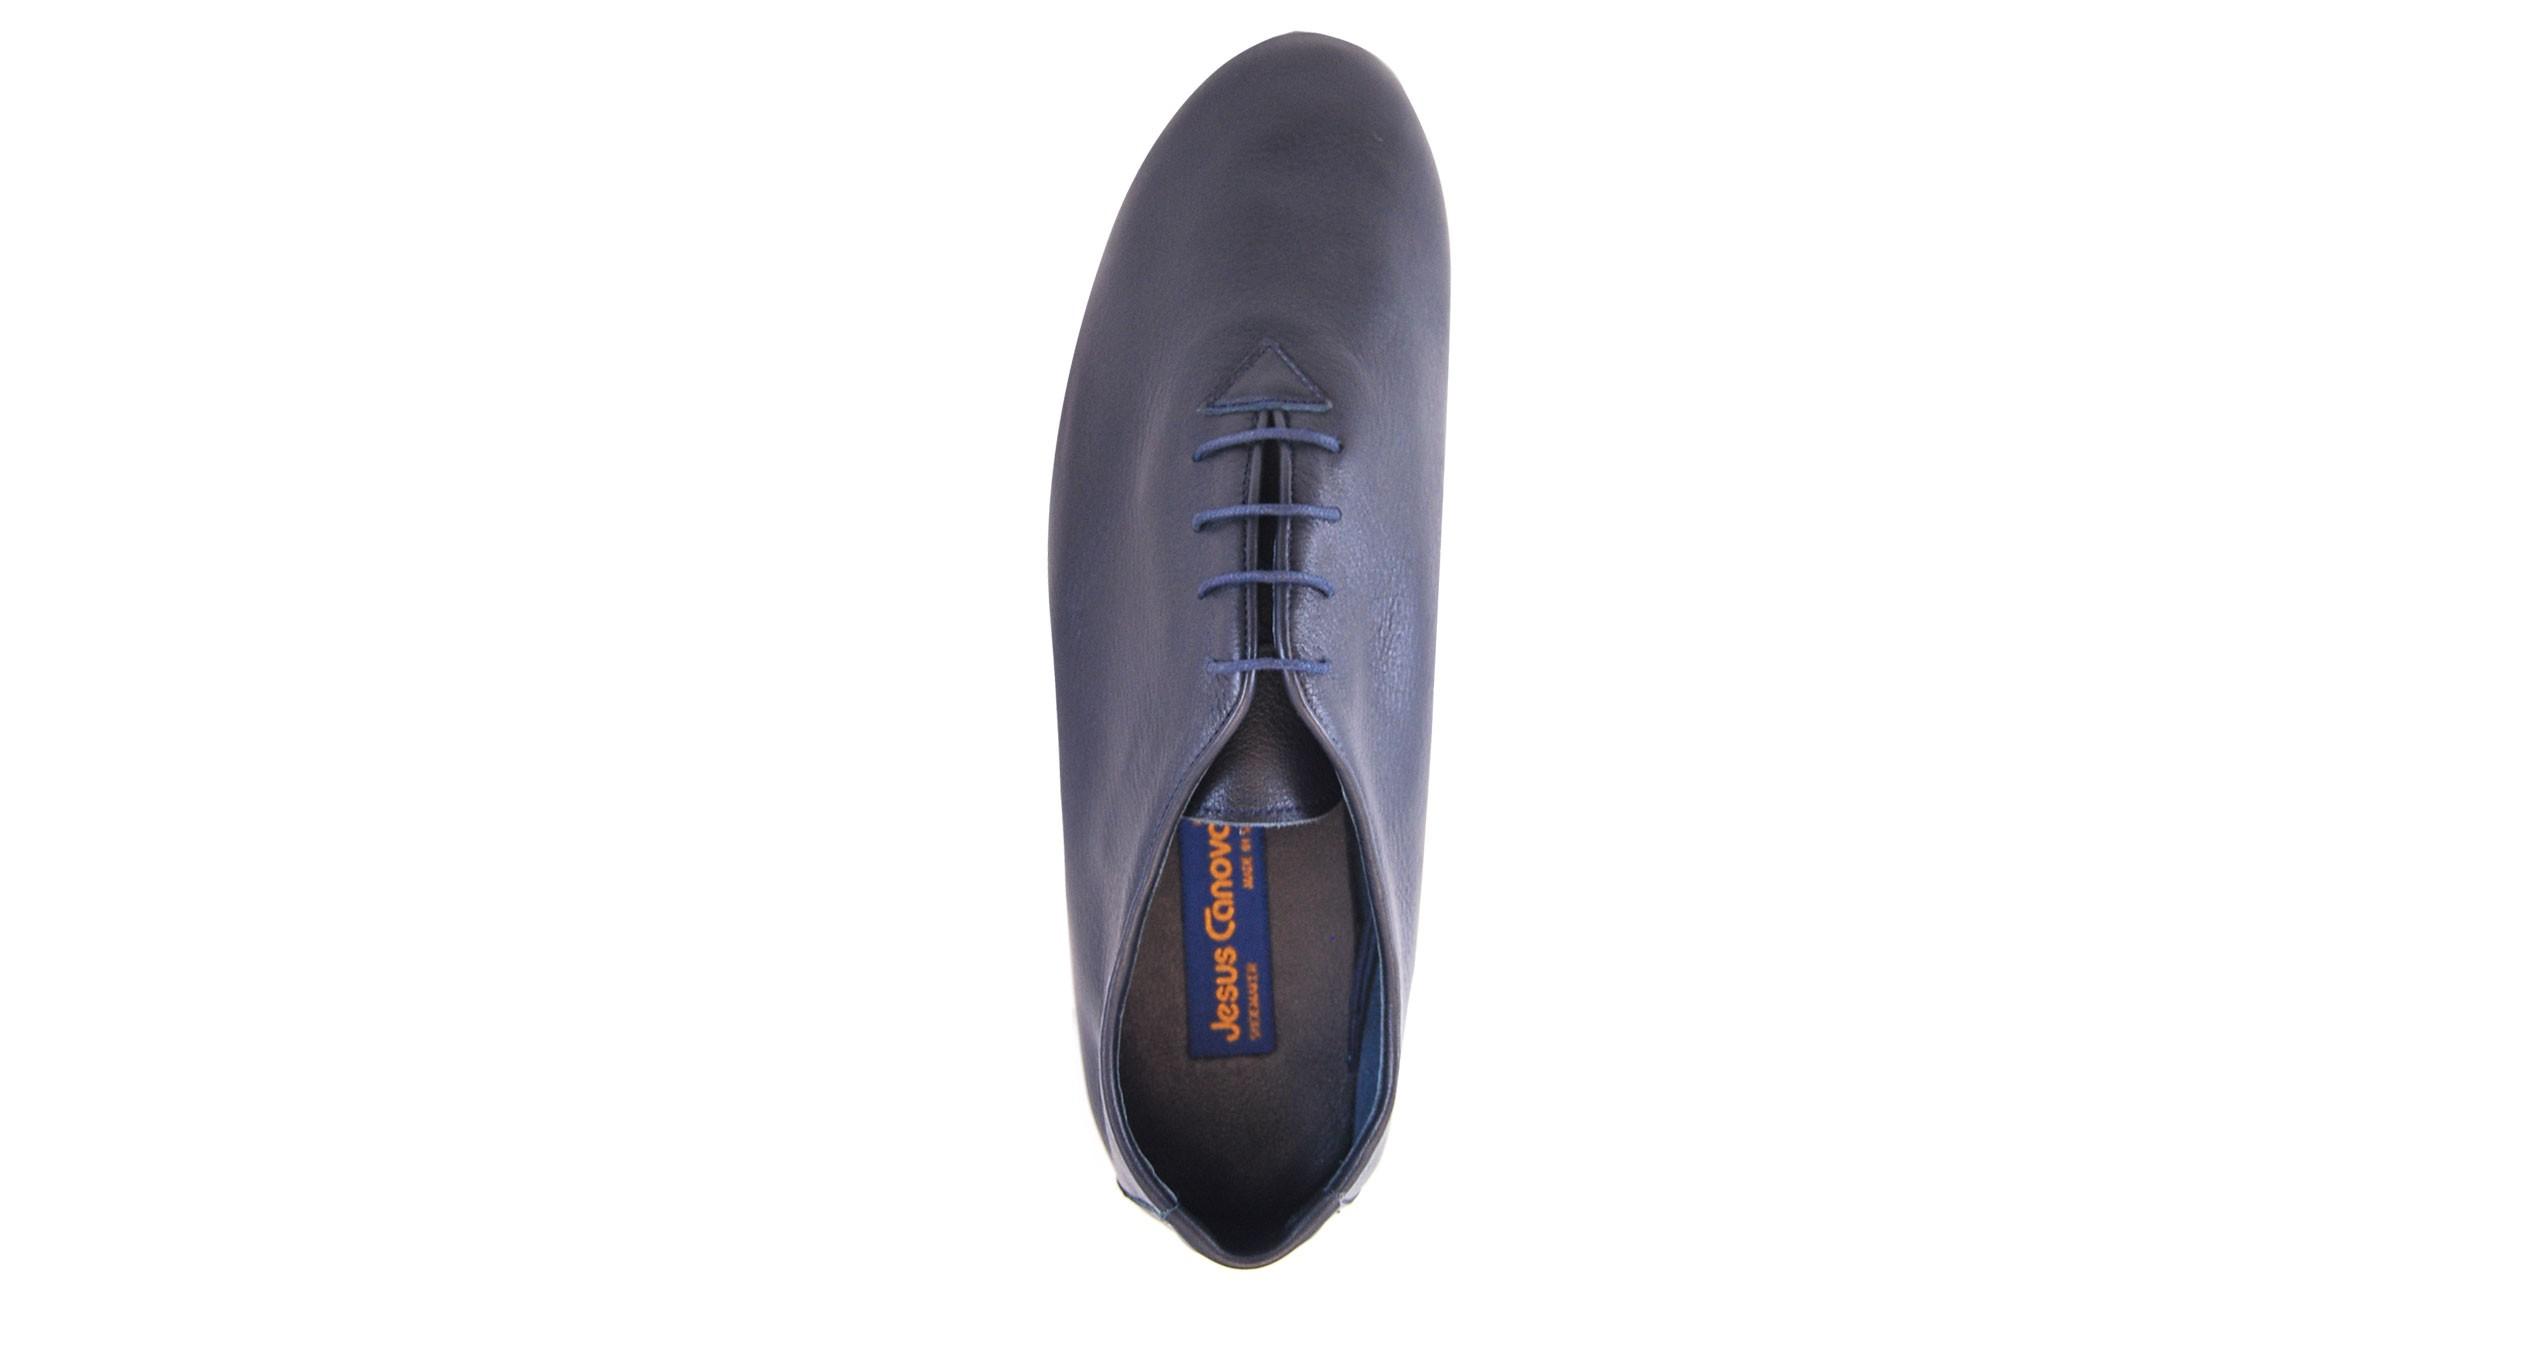 Foto 2 de Zapatos Julio Iglesias Cordon 529 JC Marino Napa